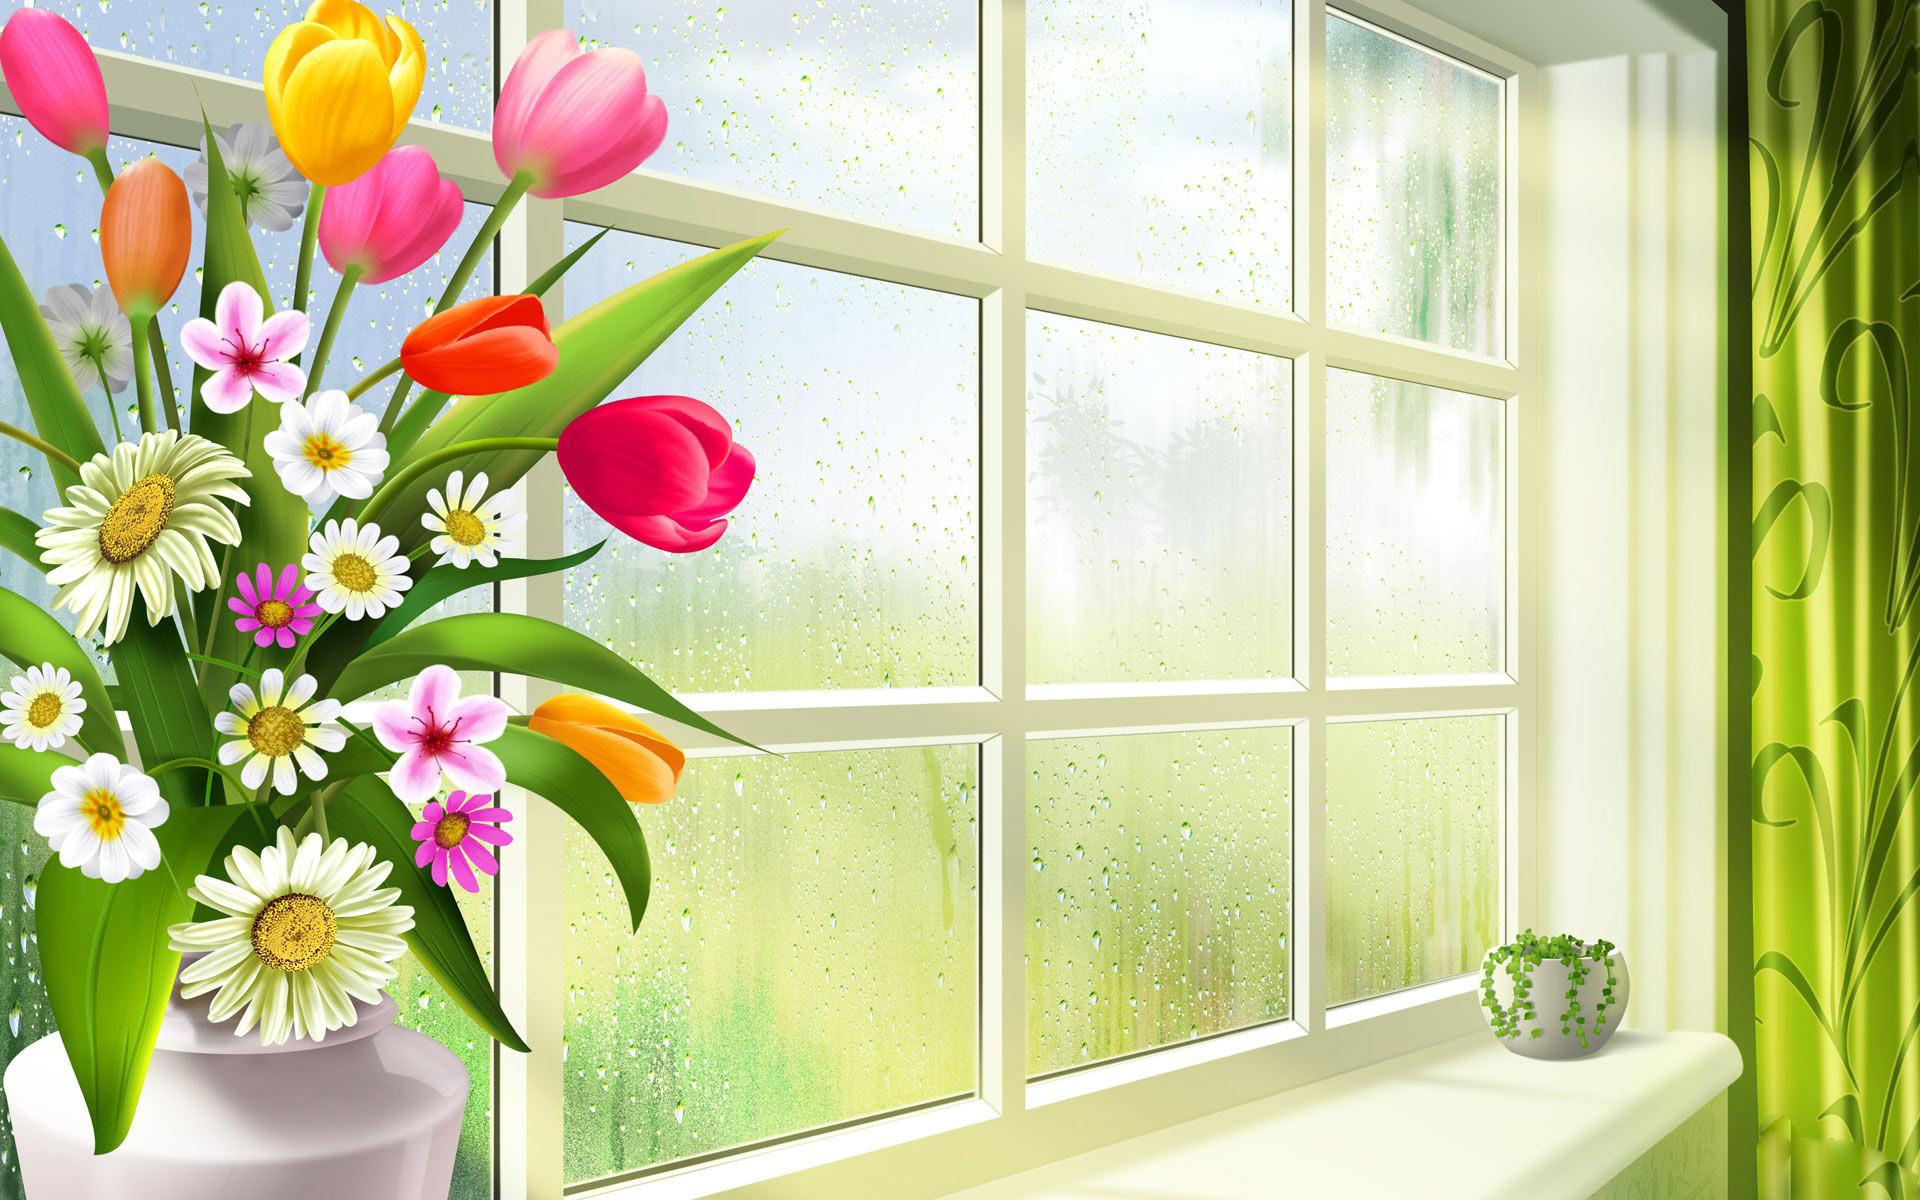 Backgrounds, wallpaper, Pretty Spring Desktop Backgrounds hd wallpaper .